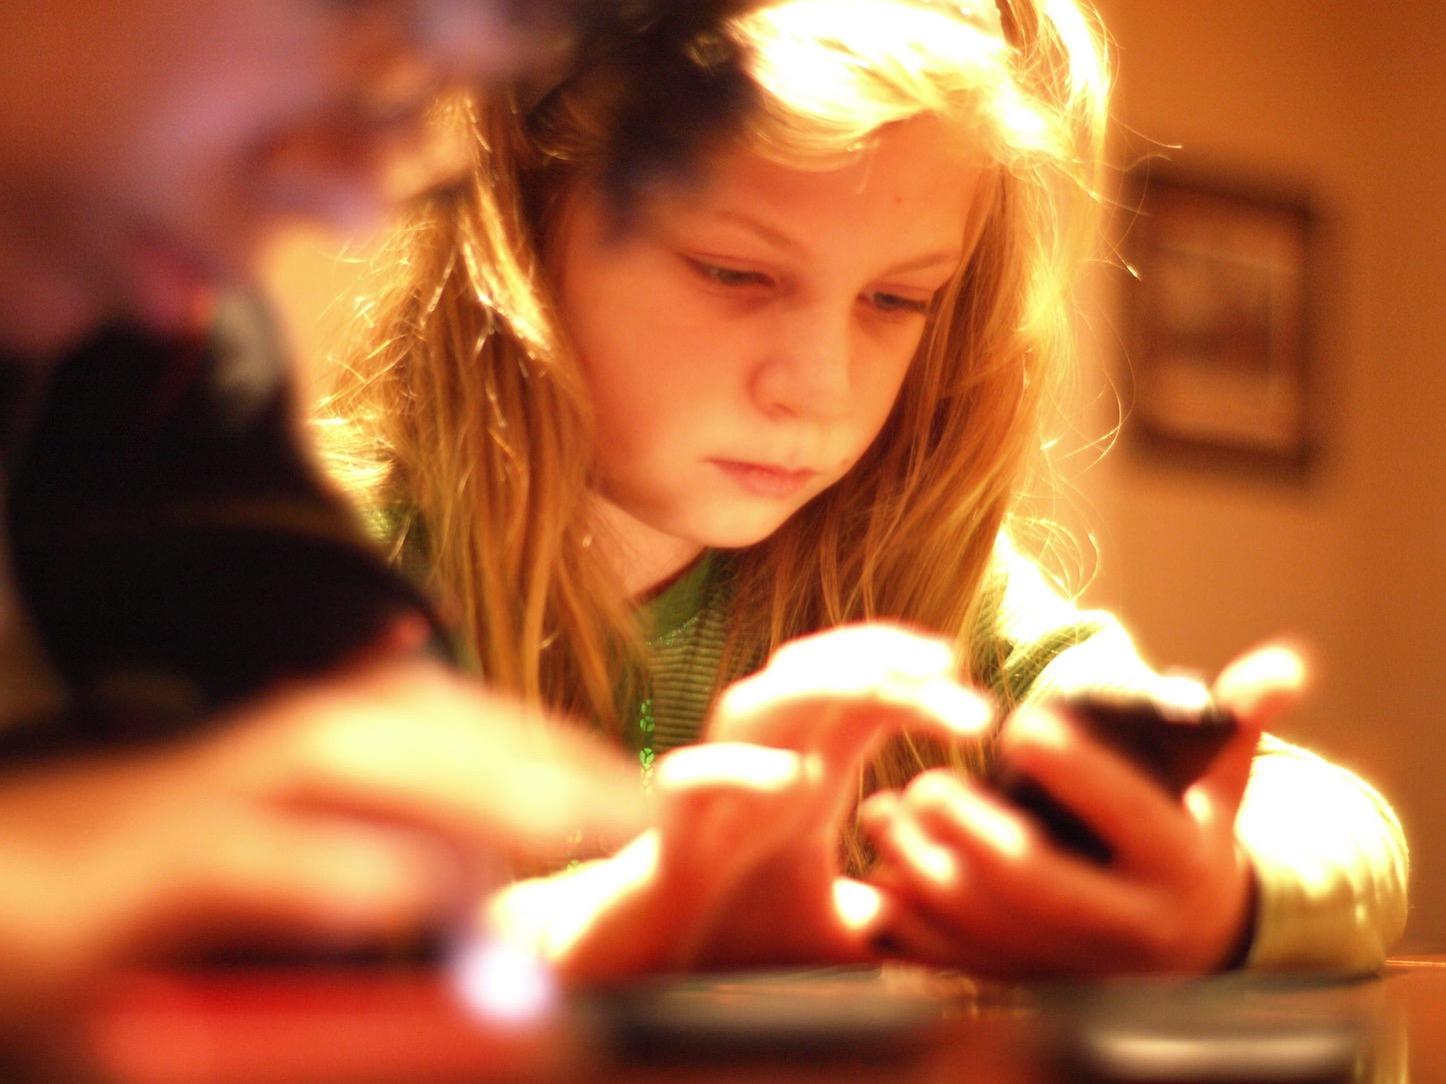 Kids using iphones